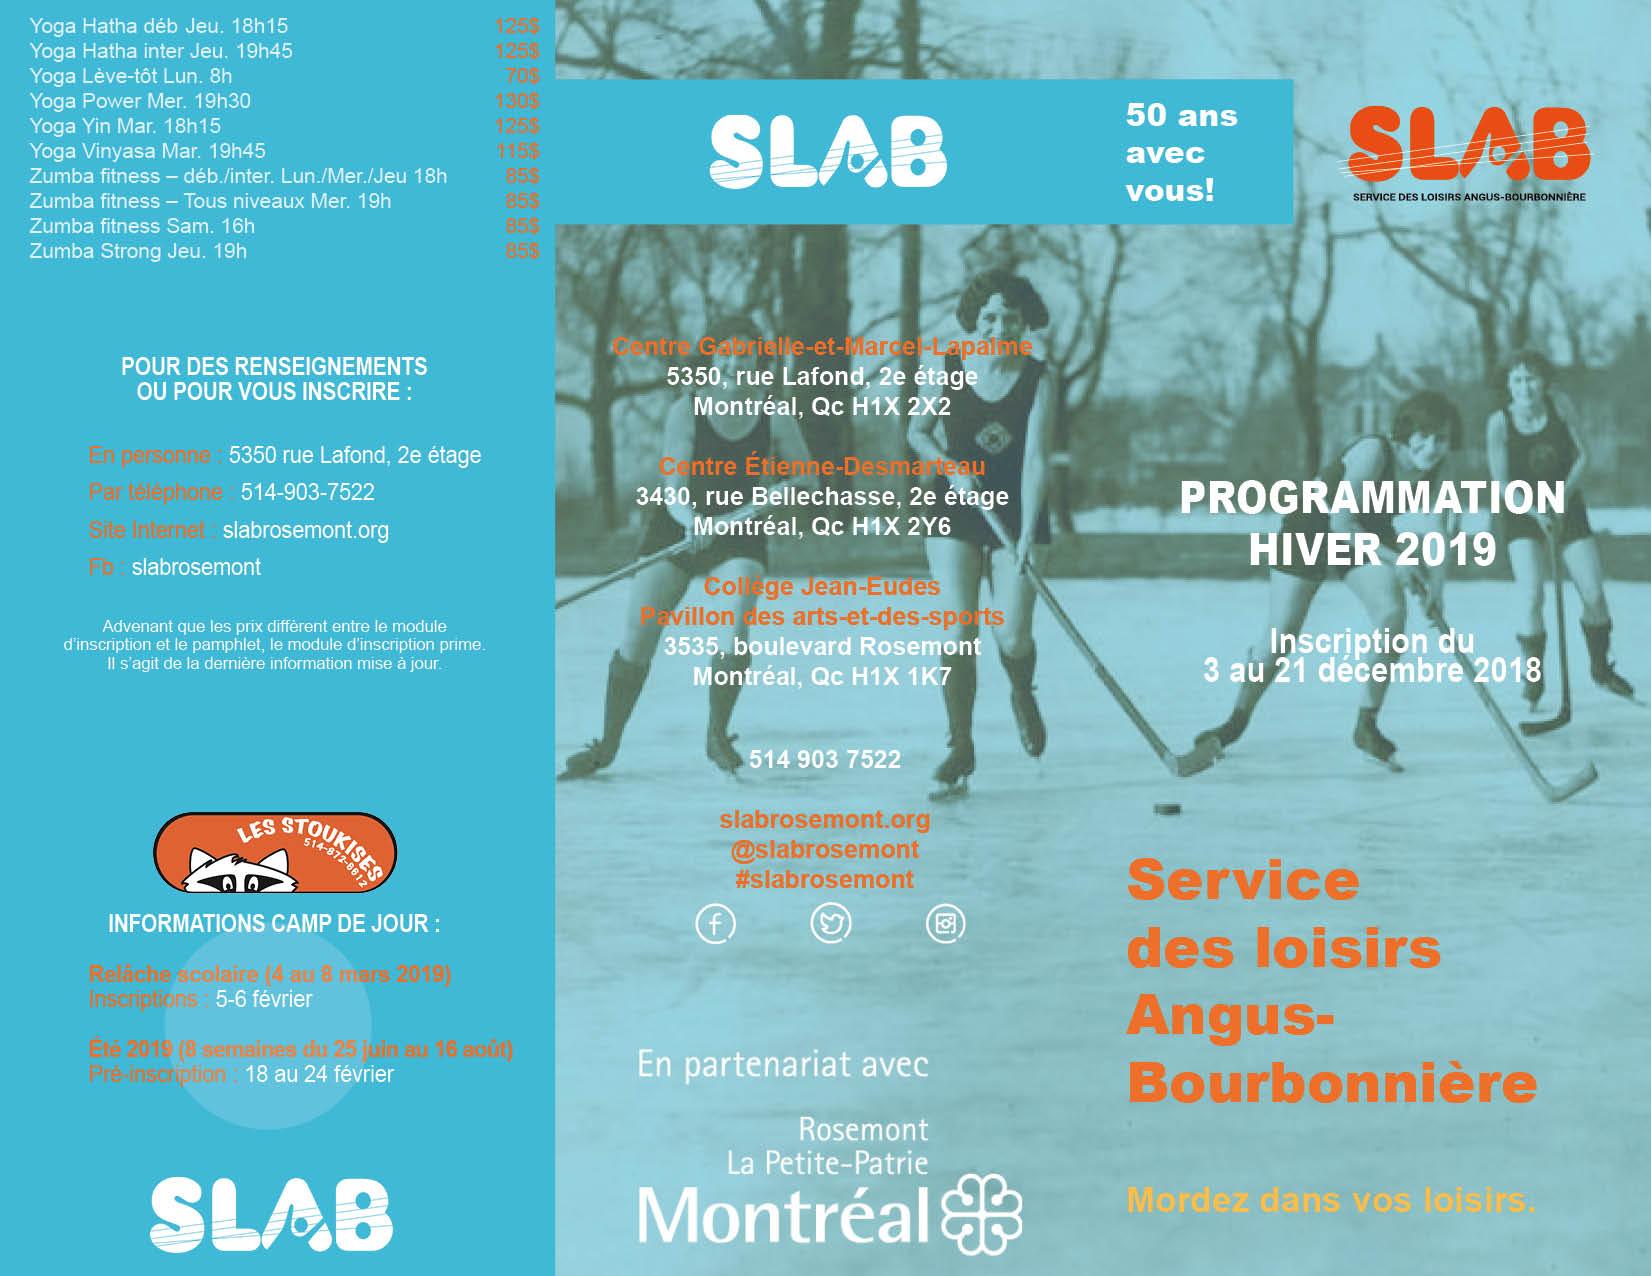 SLAB Brochure EXTER - Hiver 2019